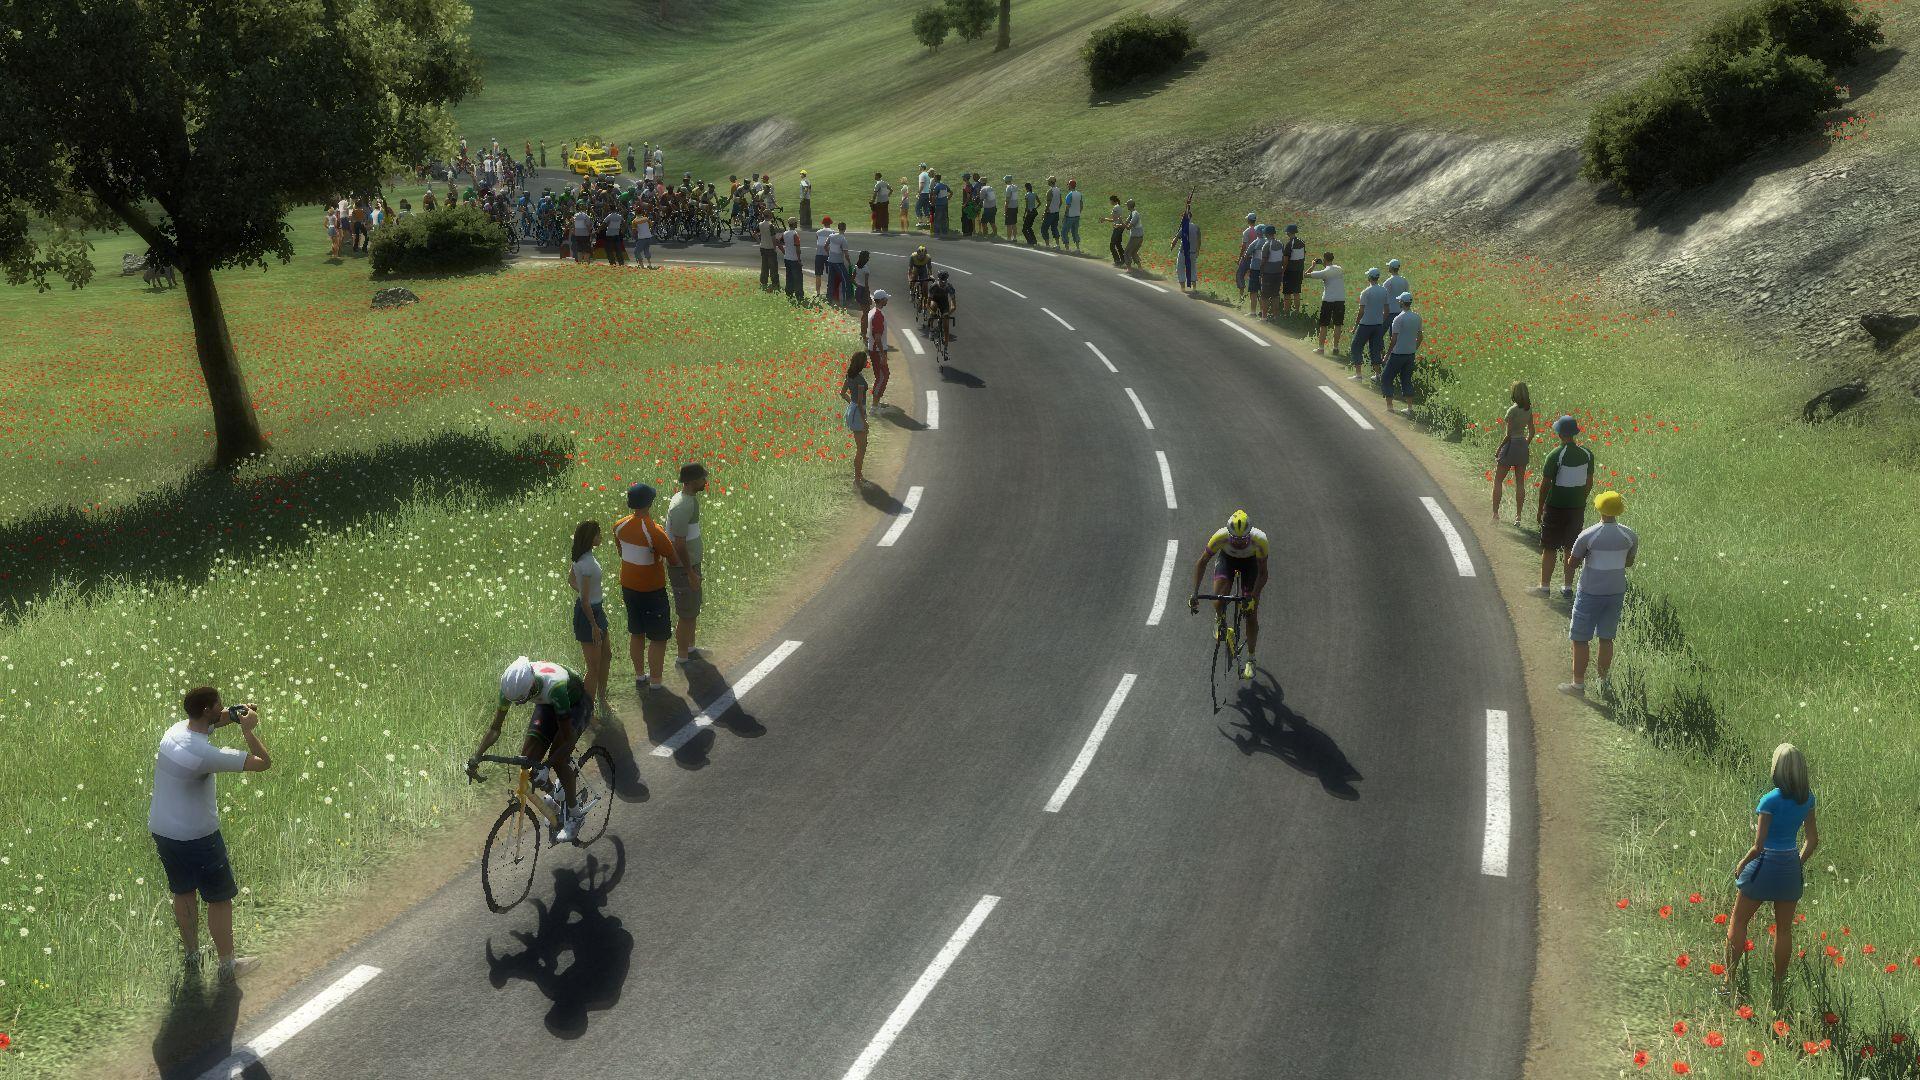 pcmdaily.com/images/mg/2017/Races/U23/Avenir/AVES7%204.jpg